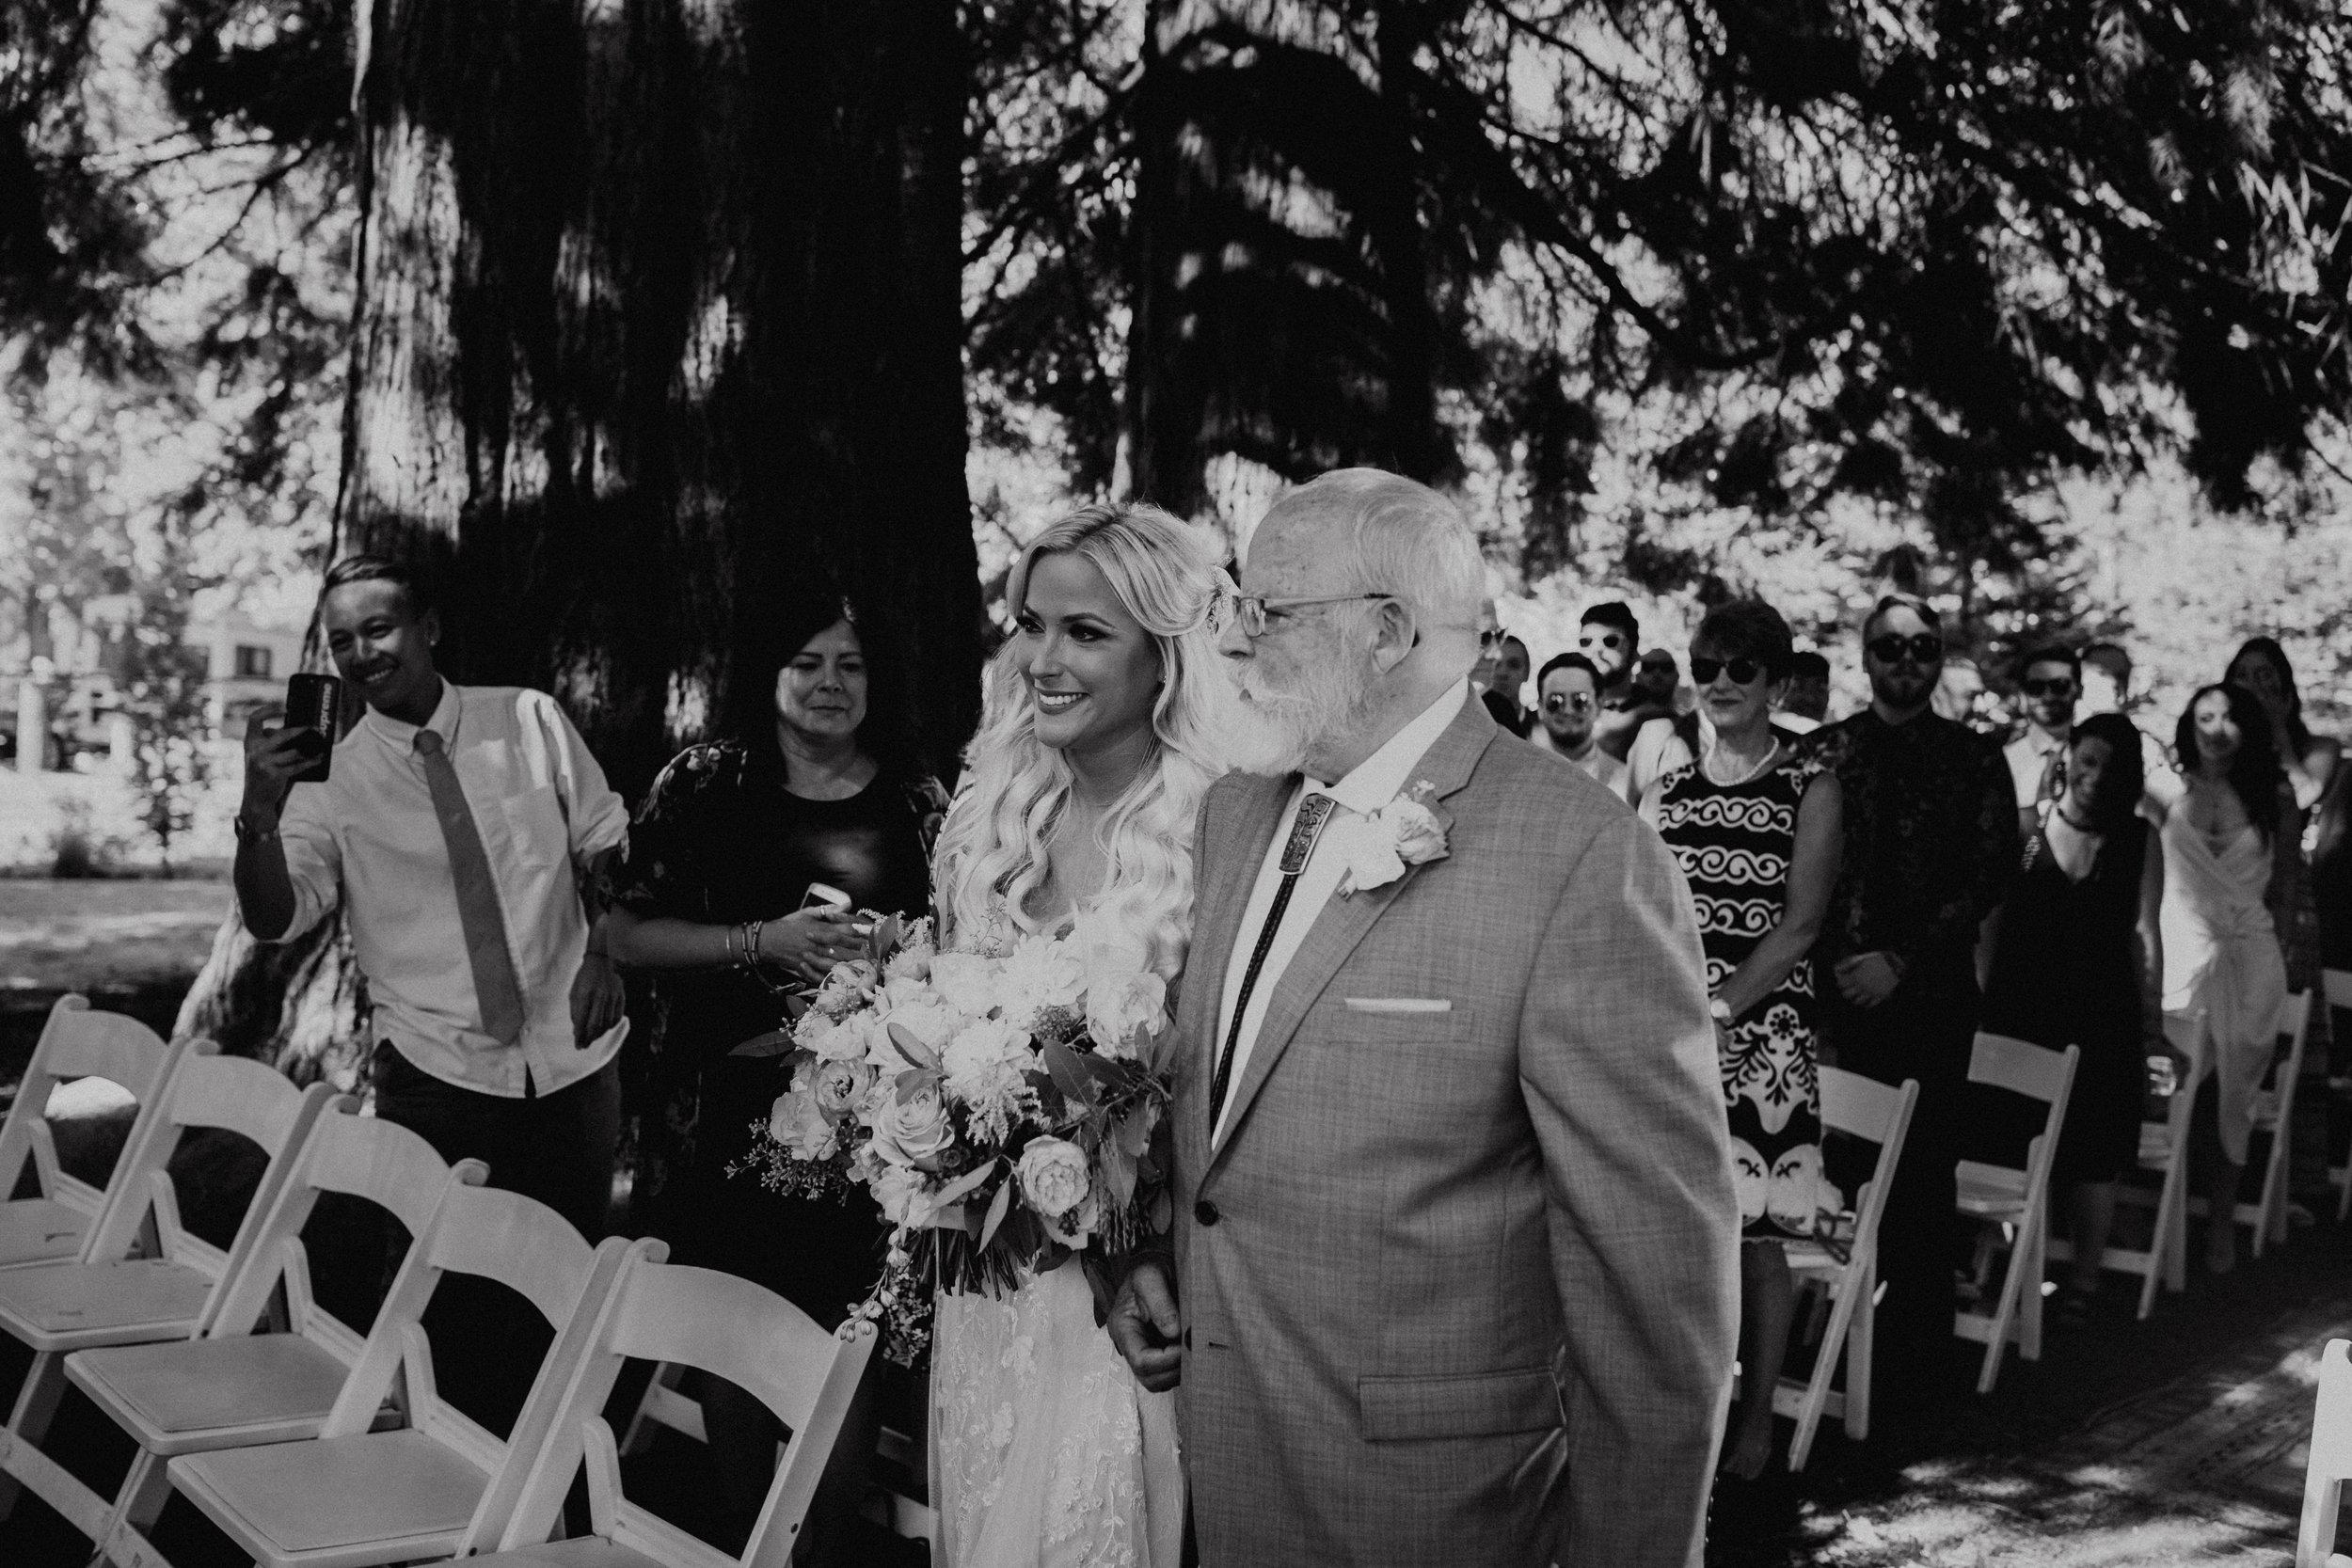 Rustic Bloom Photography |  McMenamins Grand Lodge | Ceremony Inspiration